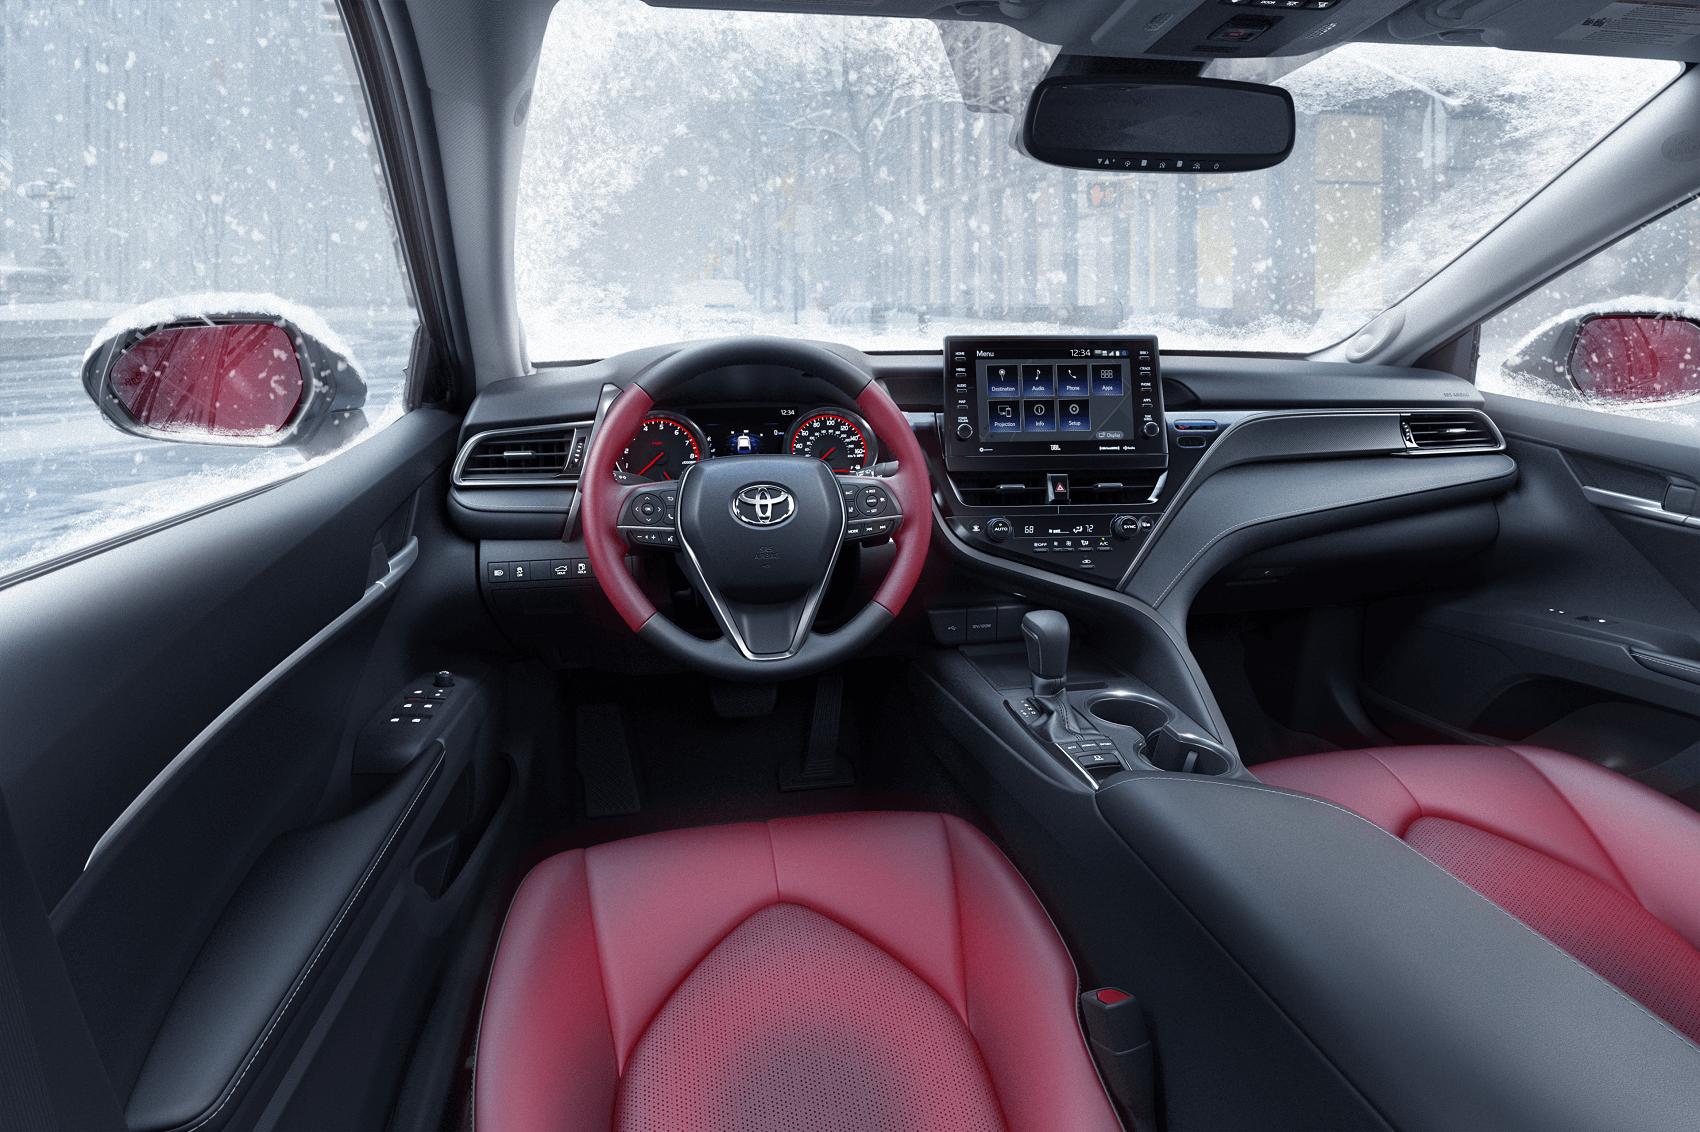 Toyota Camry Interior Madisonville KY